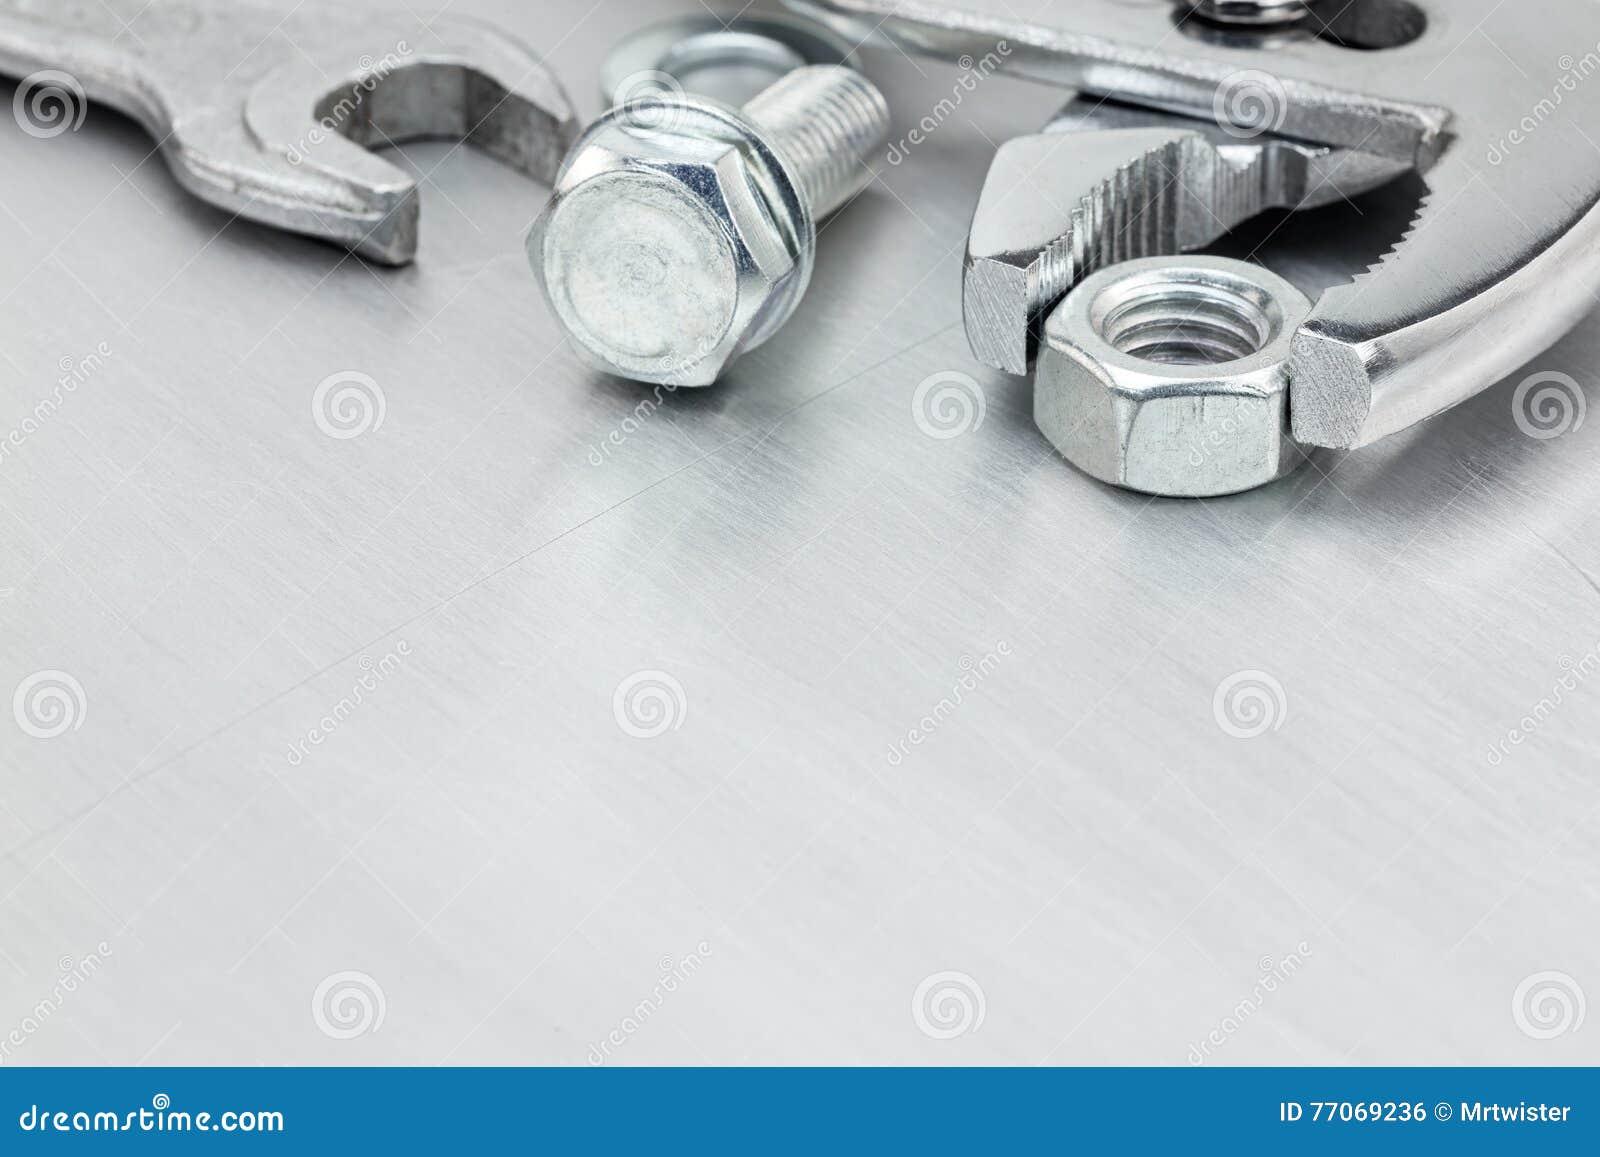 strumento di hook up dettagli